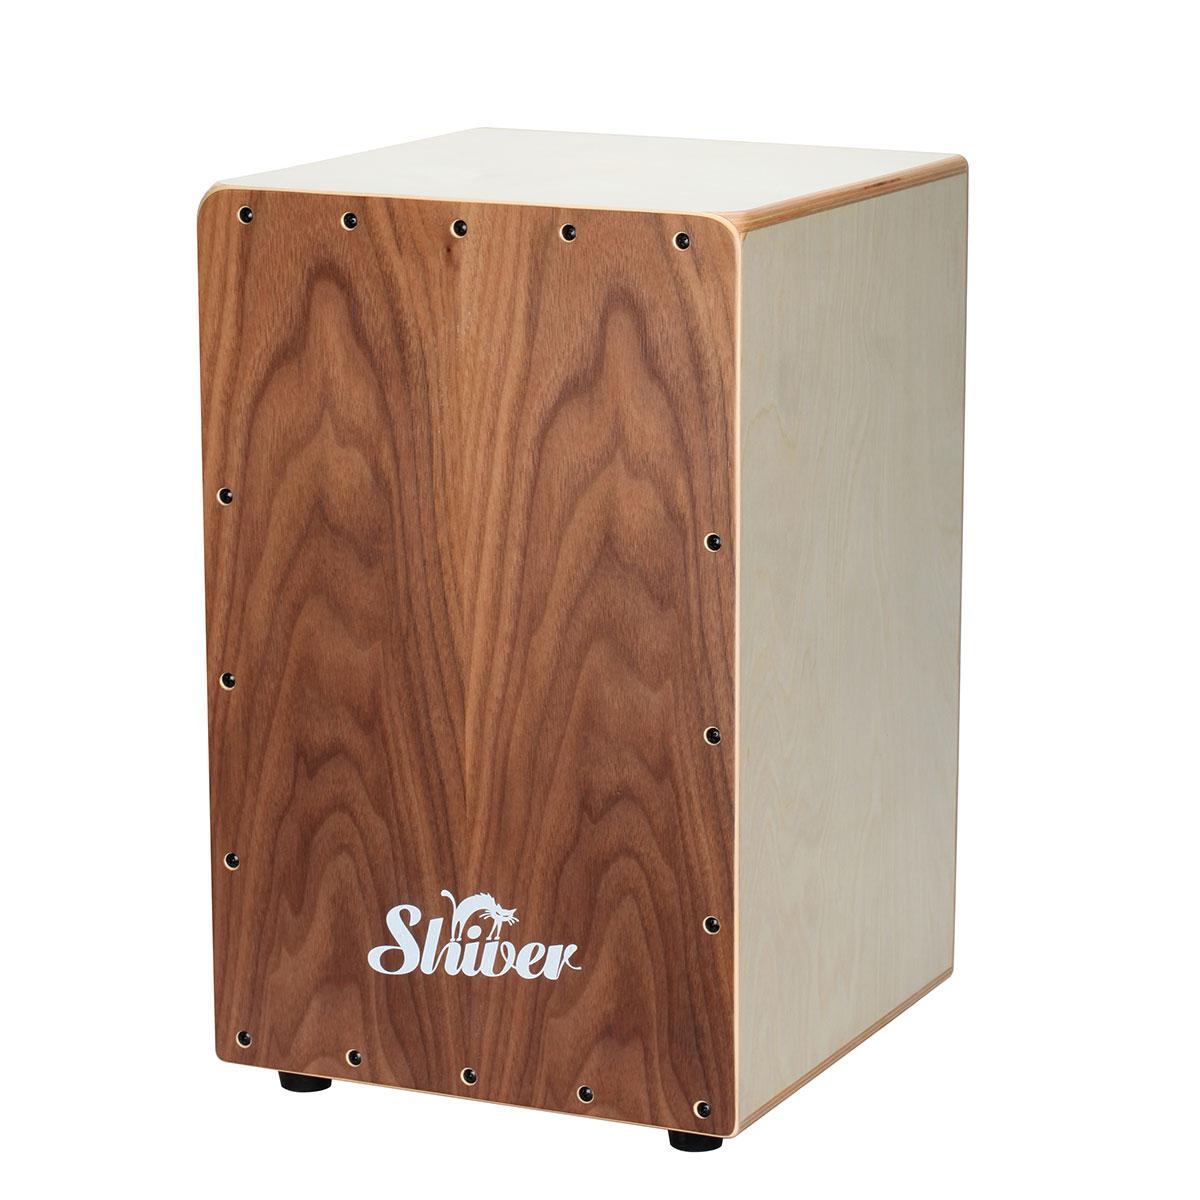 Shiver - CJS 30 Cajon noyer + housse